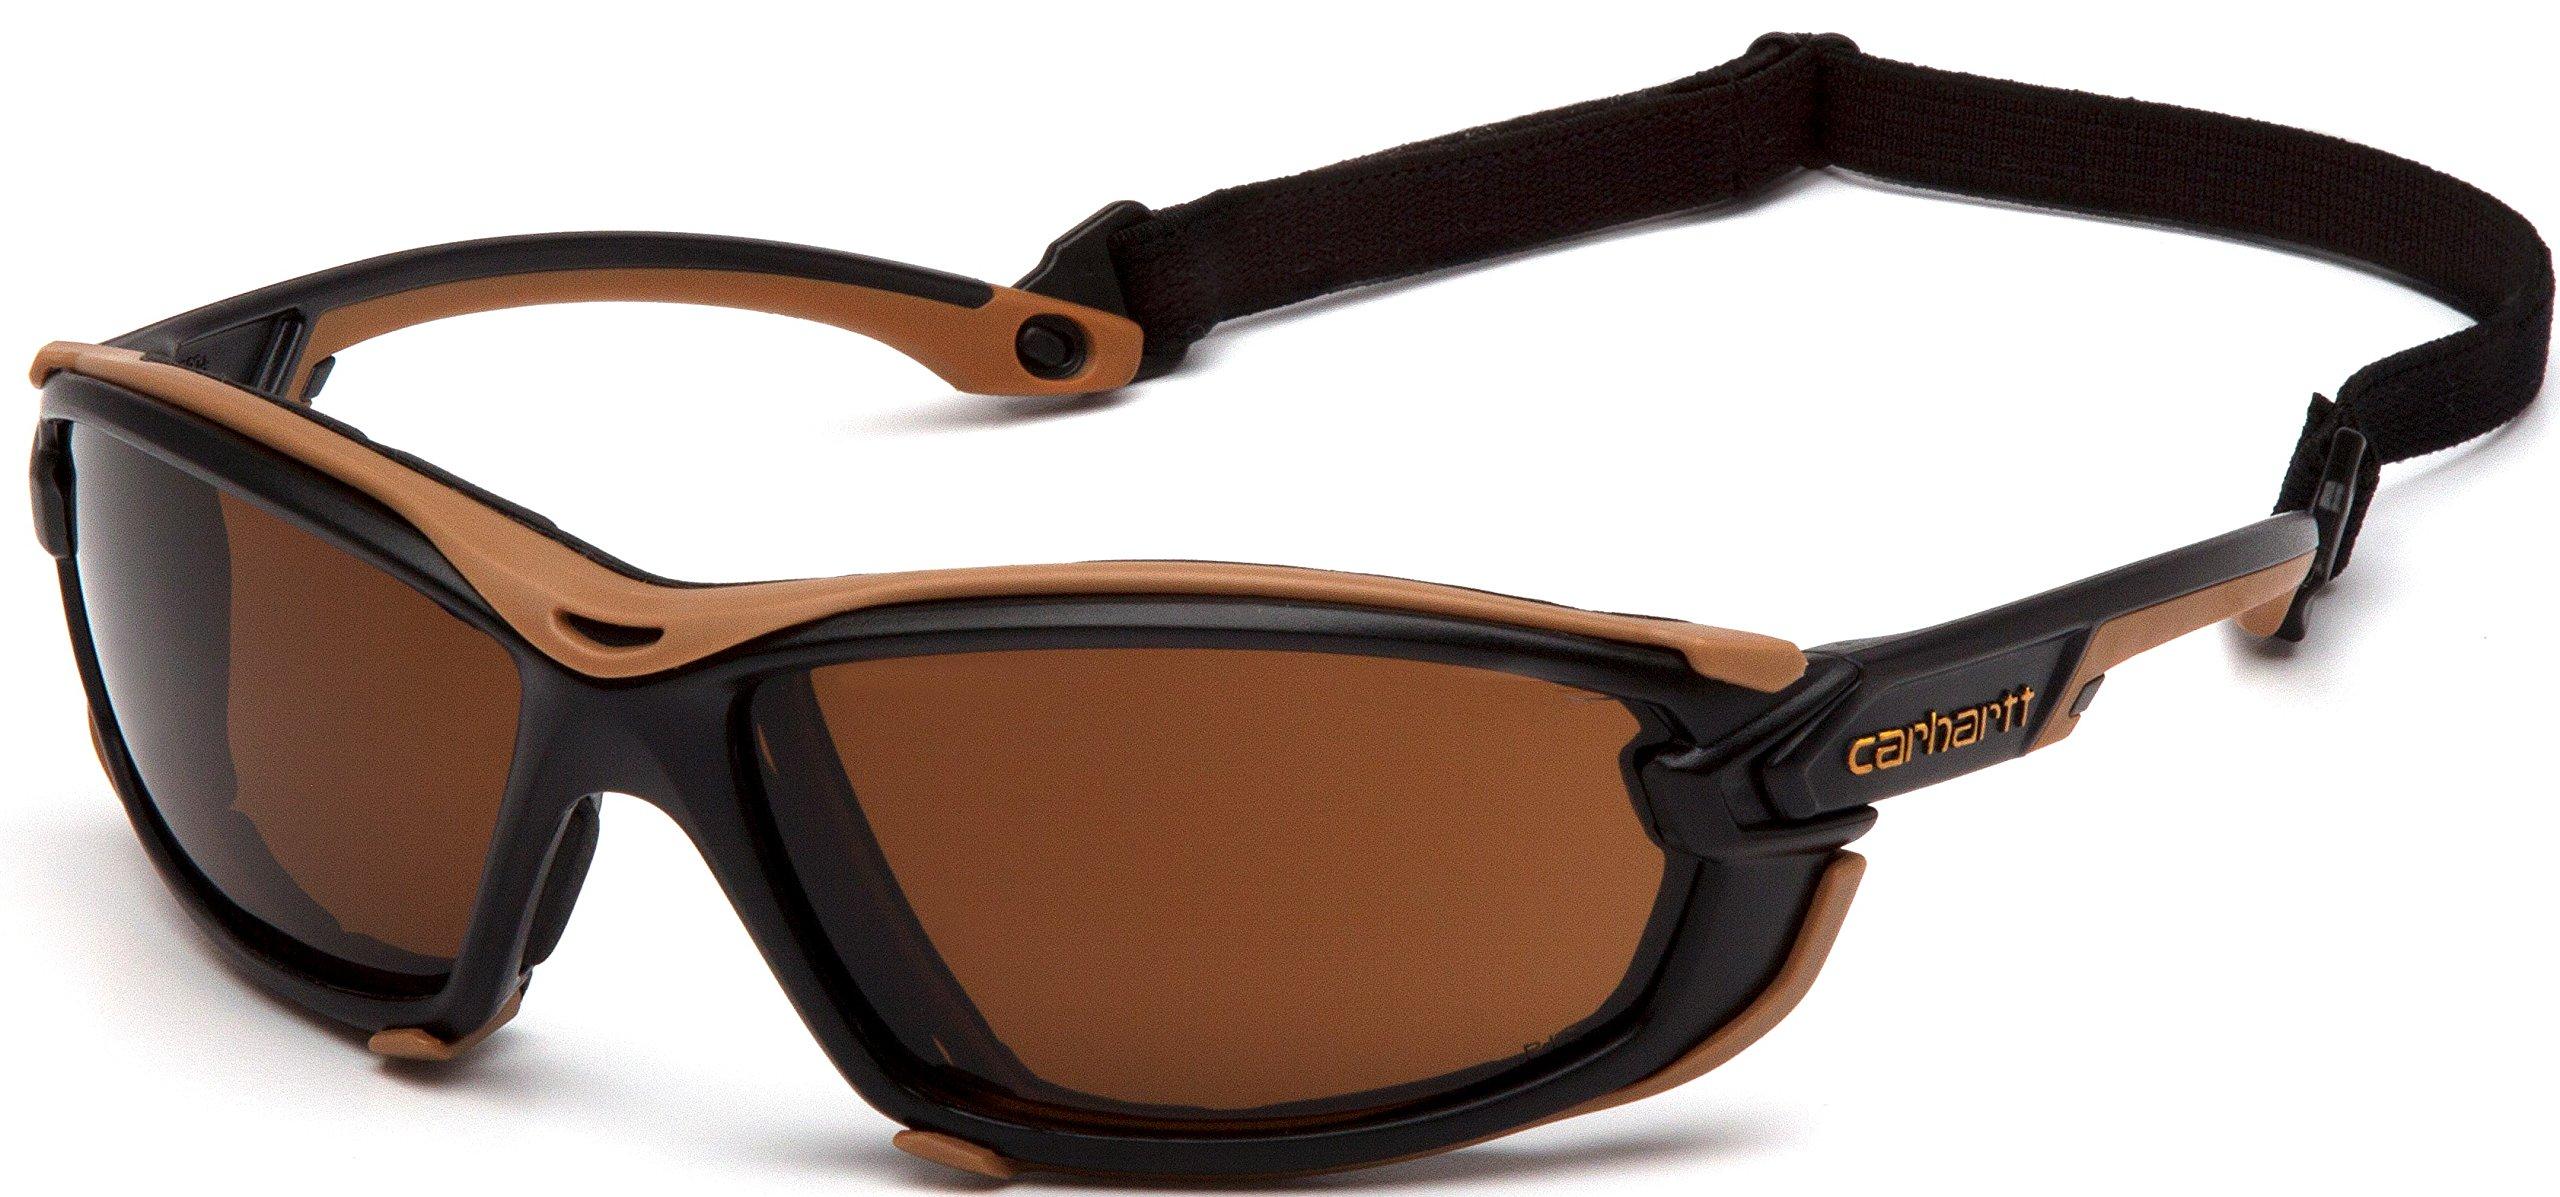 Carhartt Toccoa Safety Glasses, Black/Tan Frame, Sandstone Bronze H2MAX Anti-Fog Lens